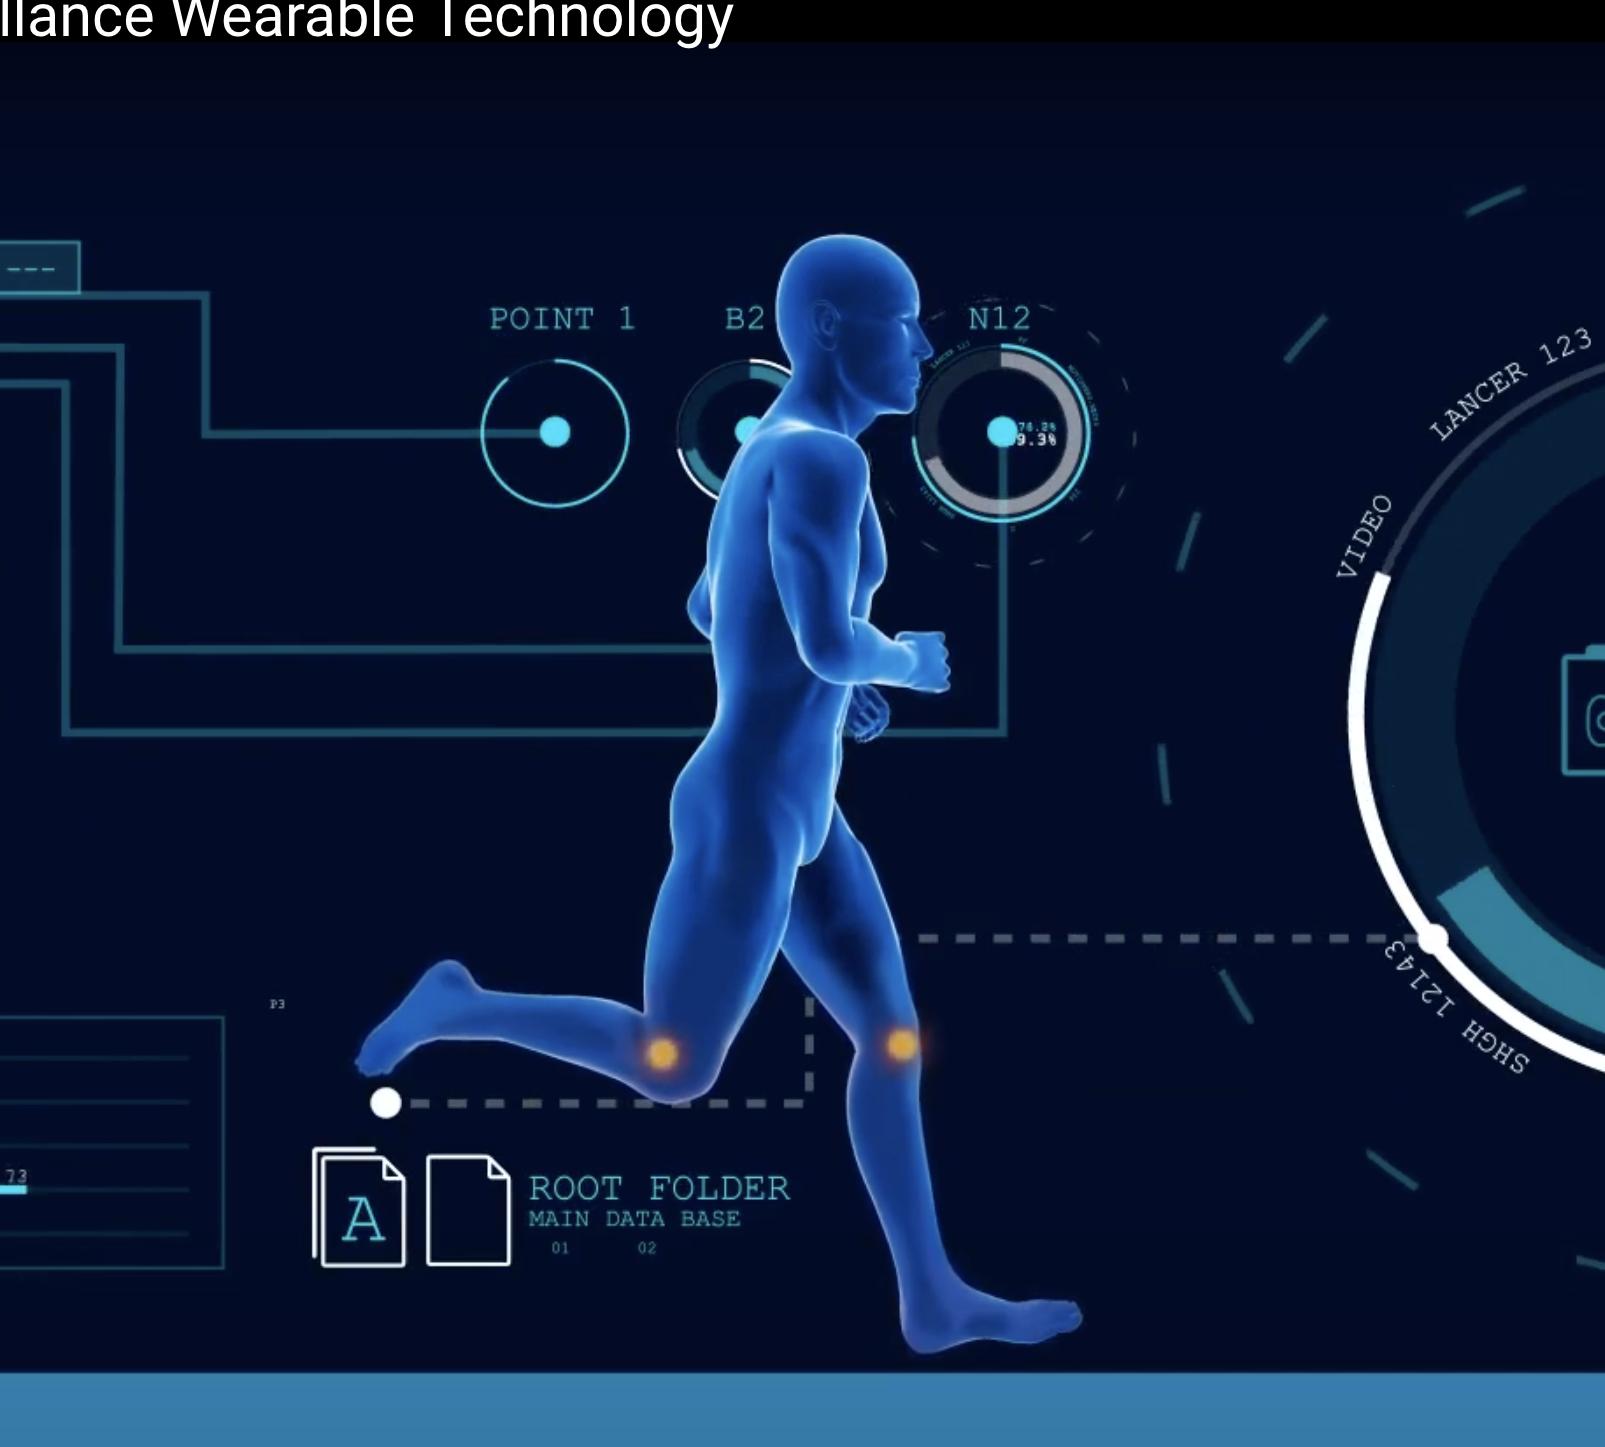 WorkCare Bio-Ergnomics